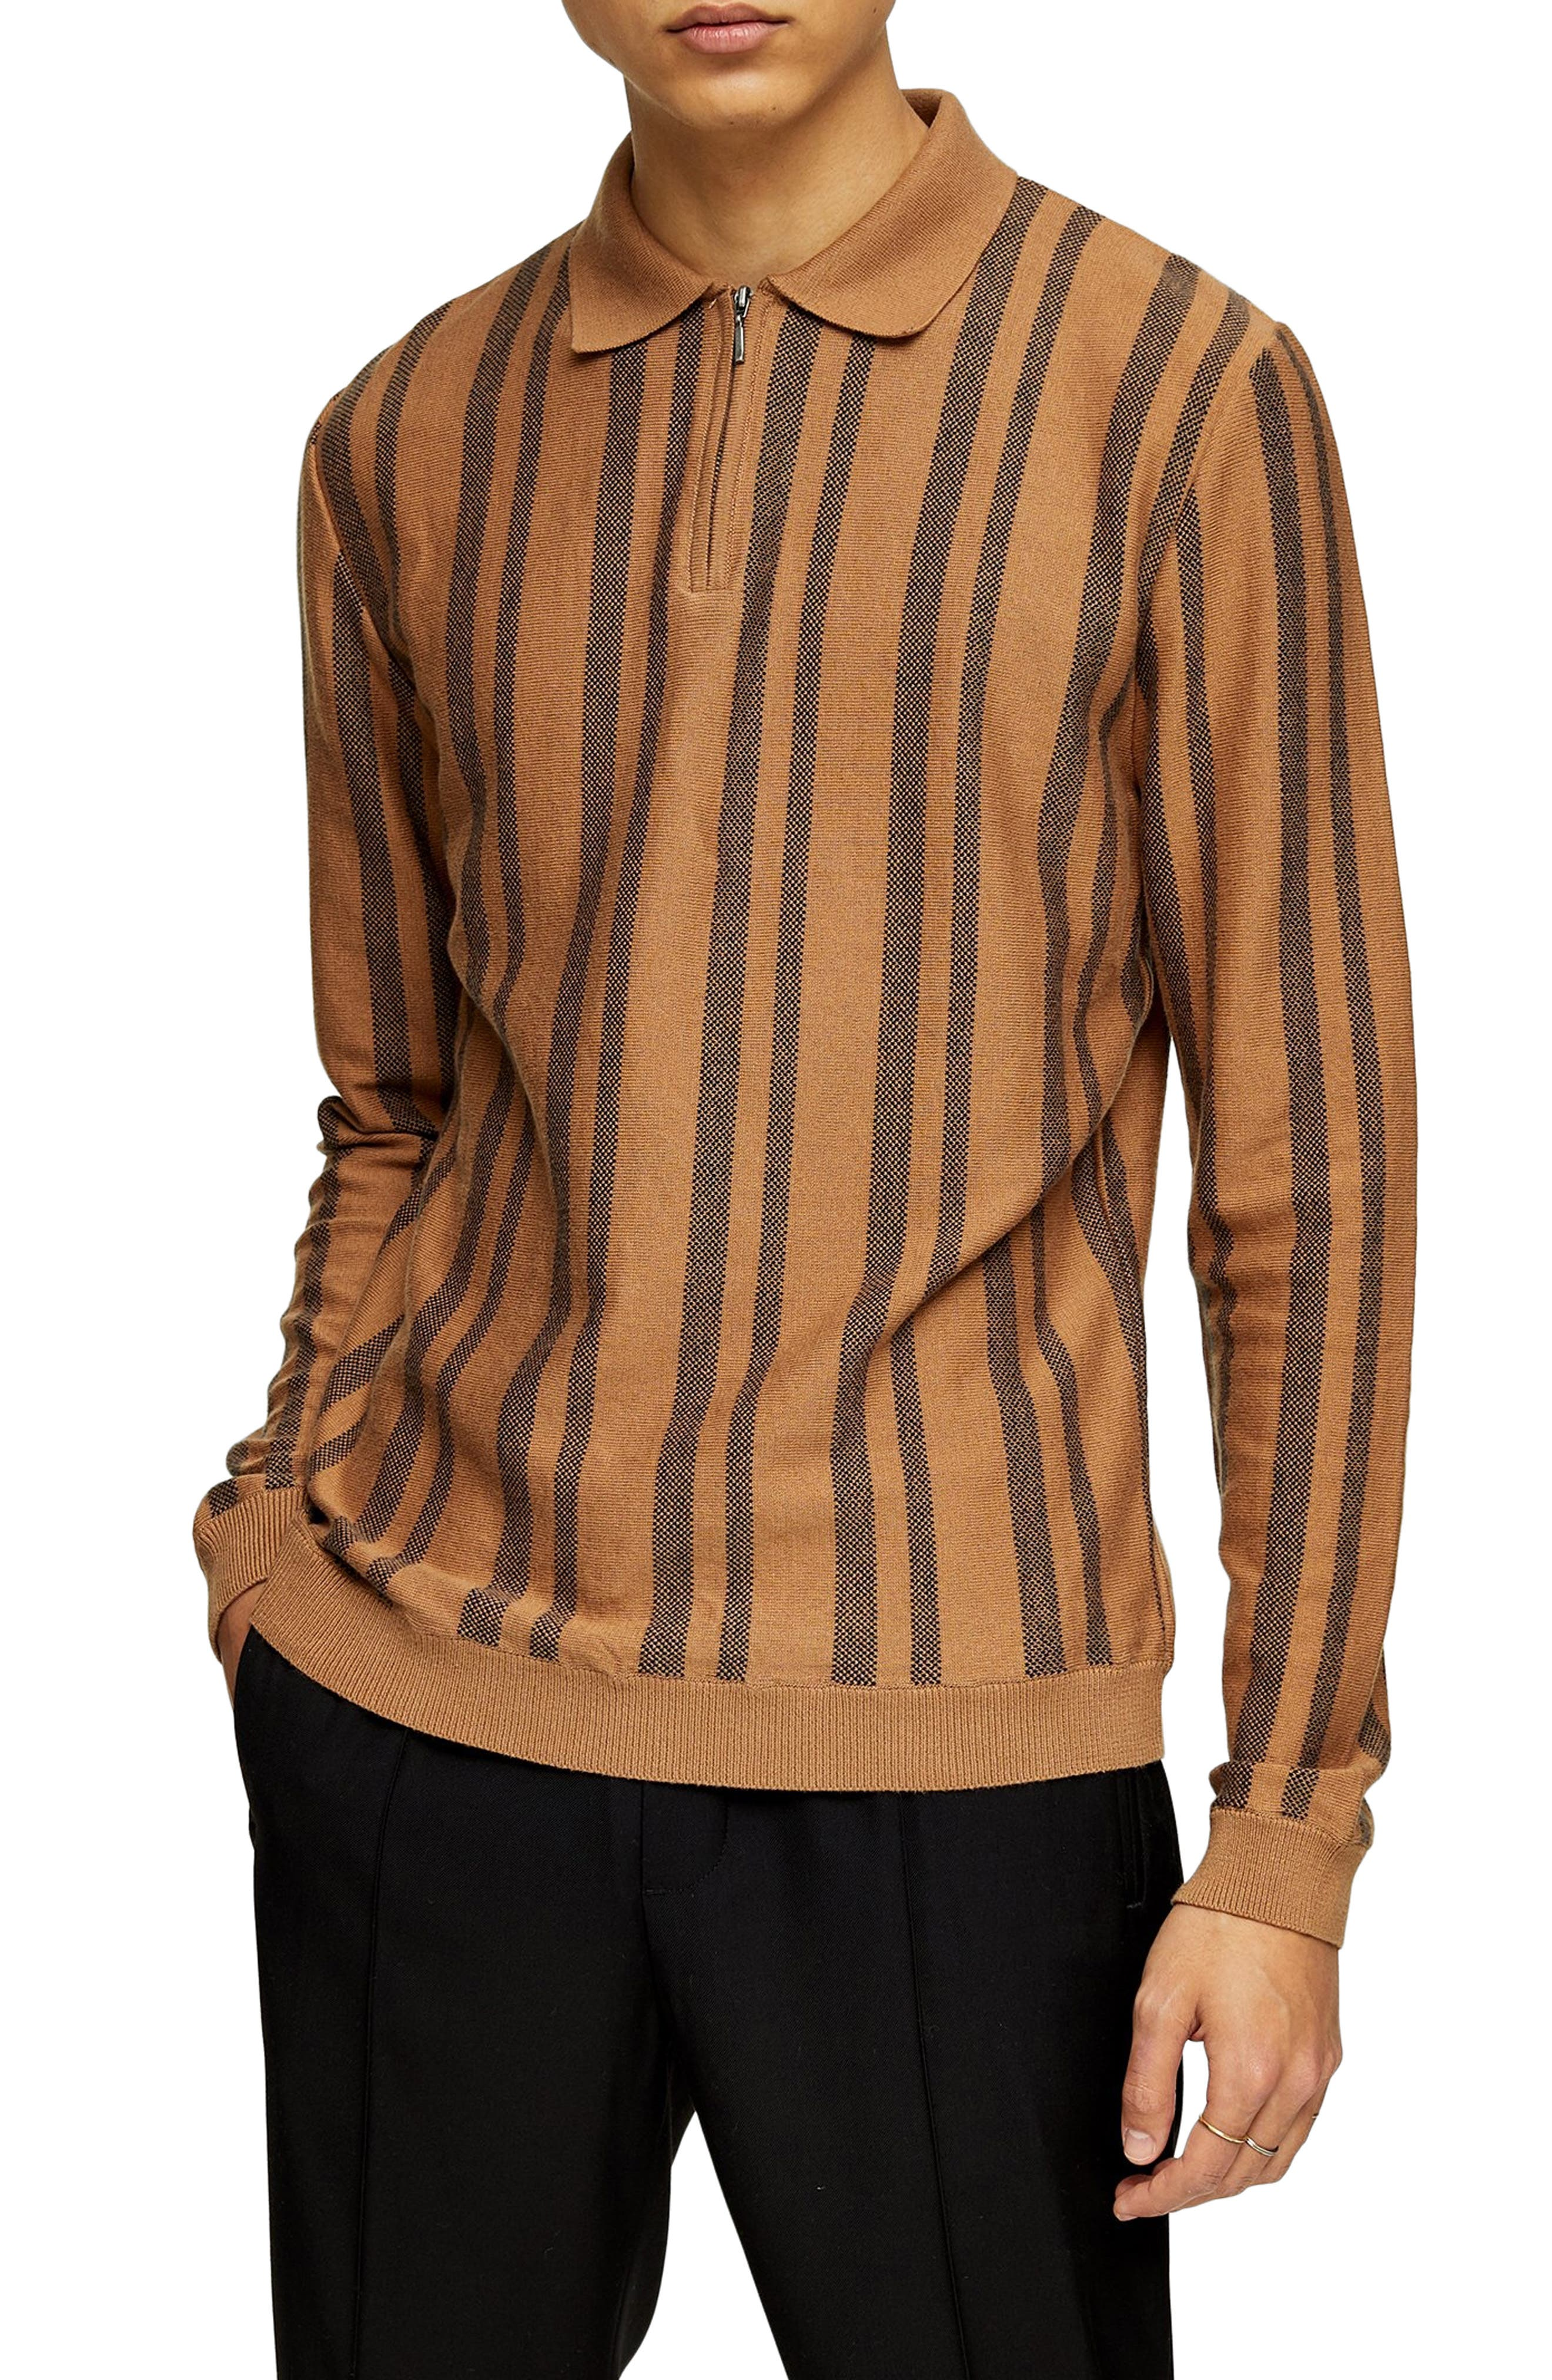 1960s Men's Clothing Mens Topman Stripe Long Sleeve Zip Polo $32.98 AT vintagedancer.com